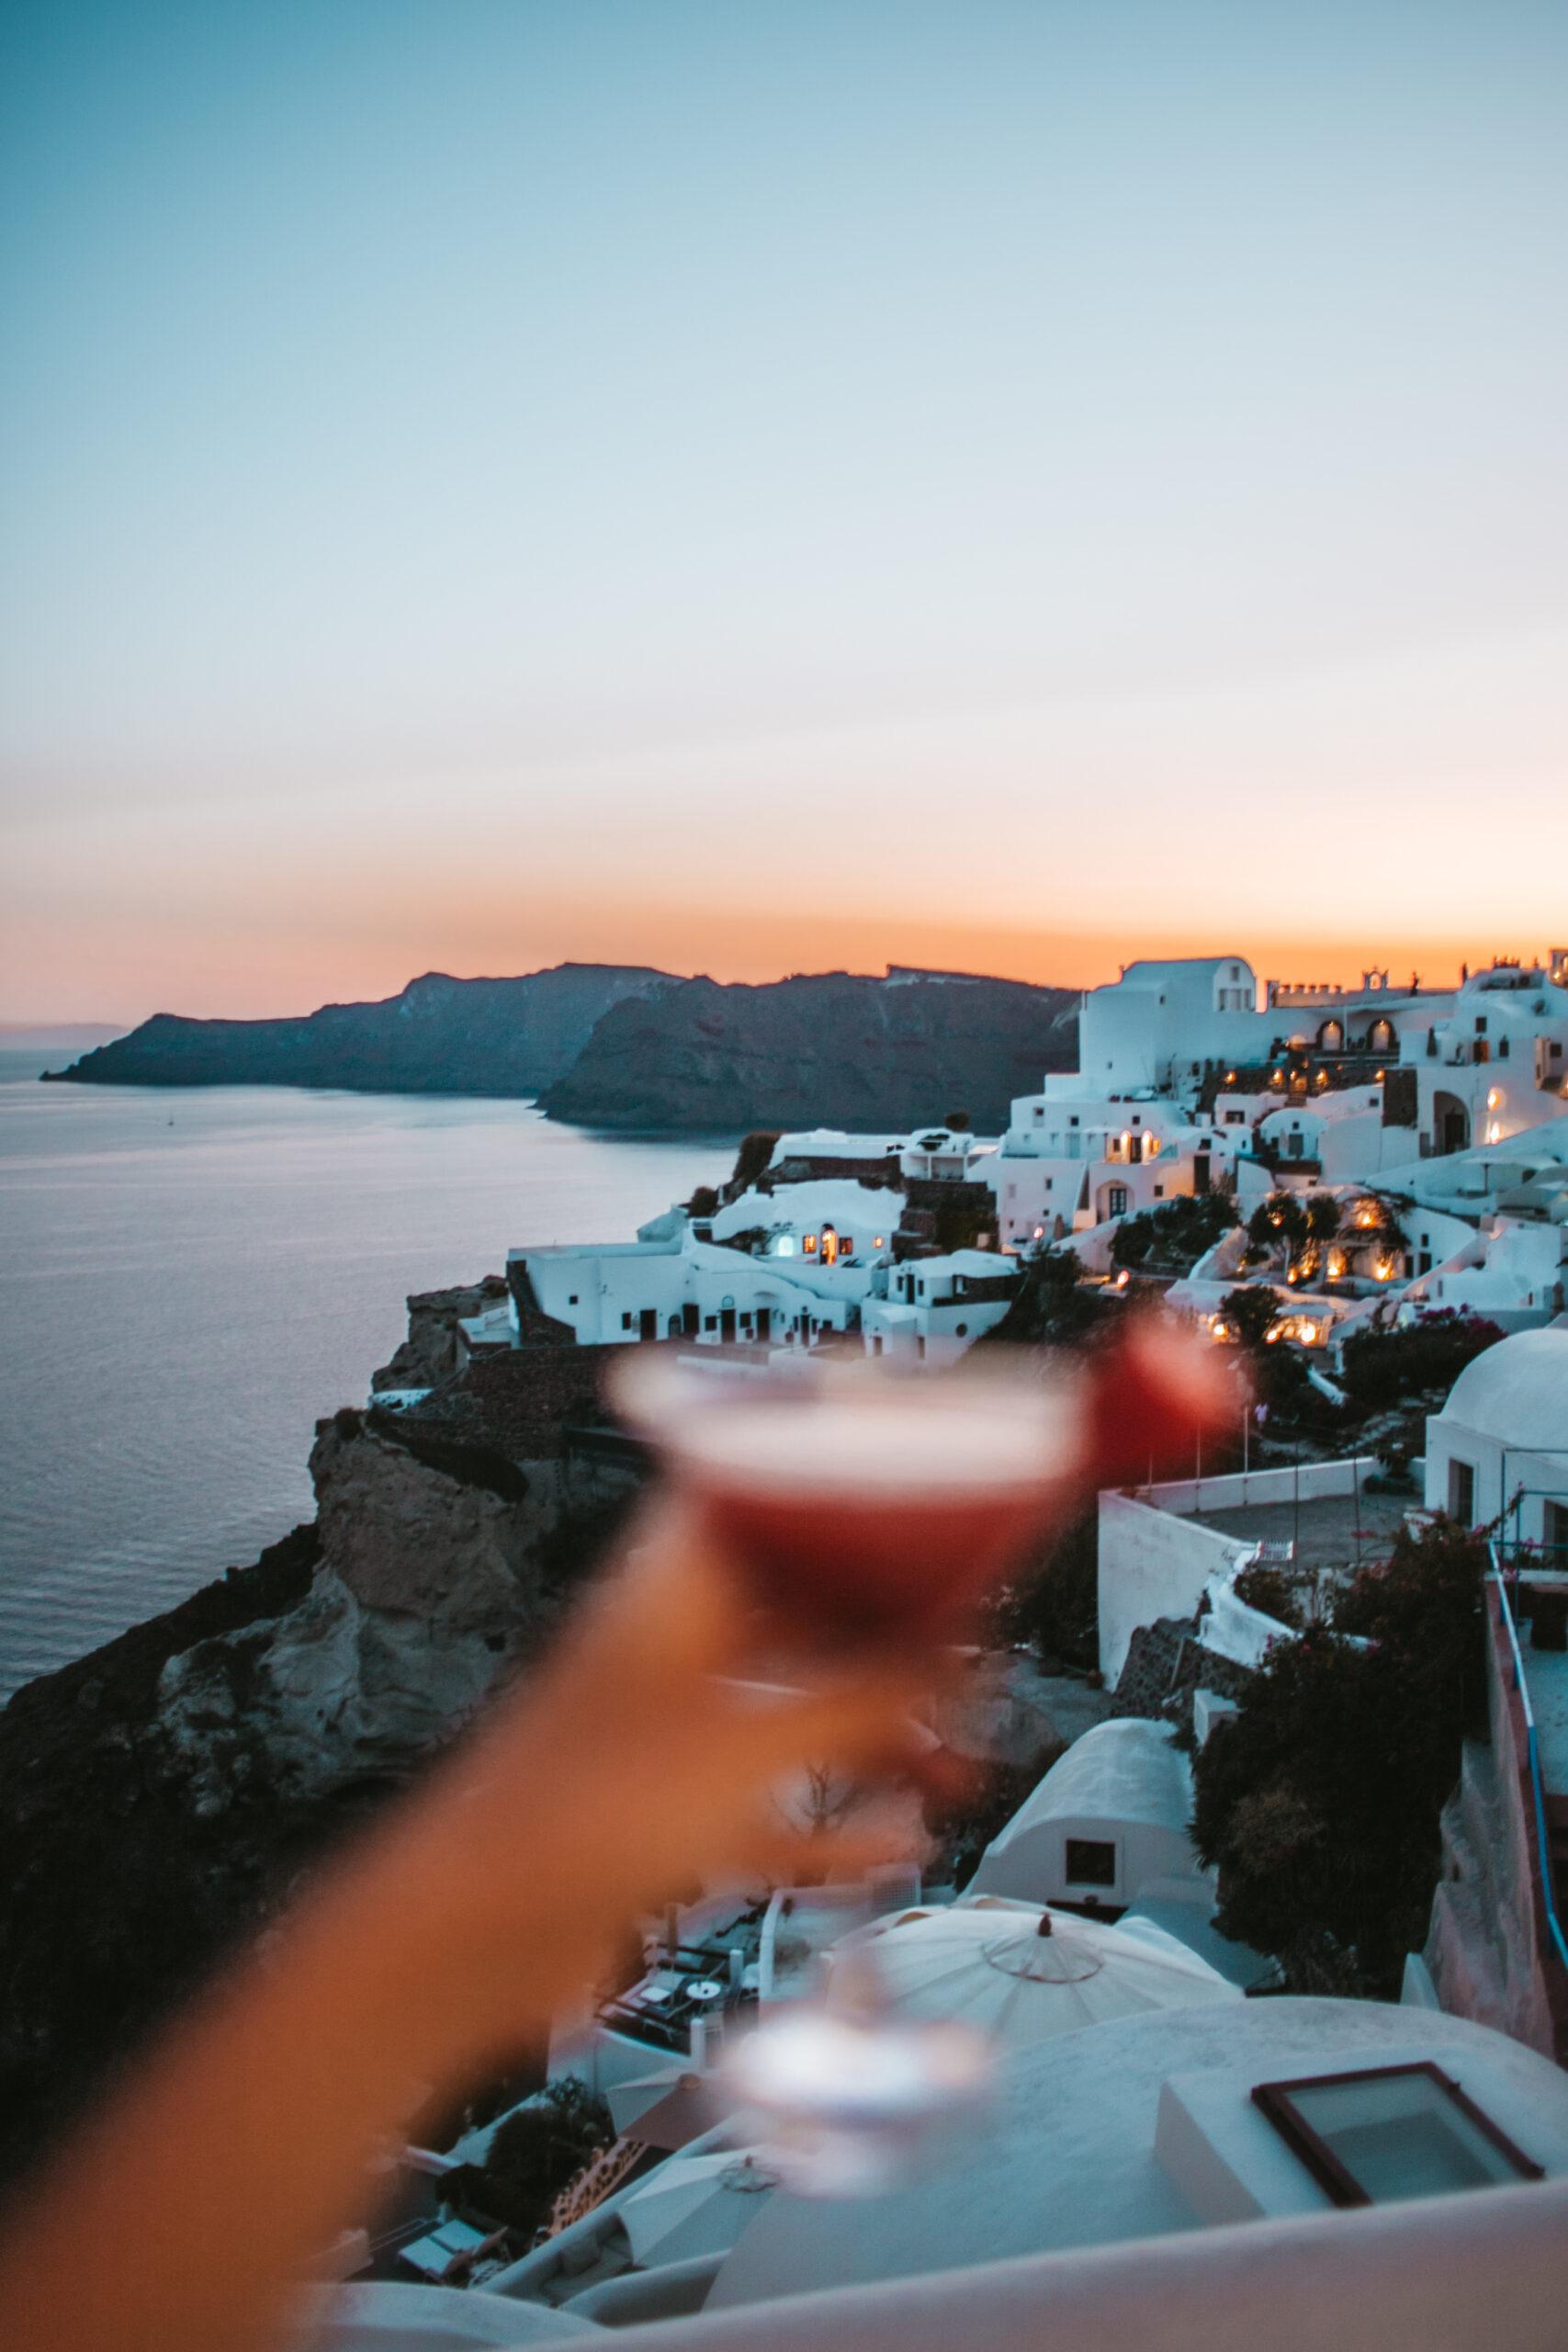 Sunset in Oia, Santorini sunset, night, caldera view, zachód słońca Santorini Oia, kaldera Oia, caldera Oia